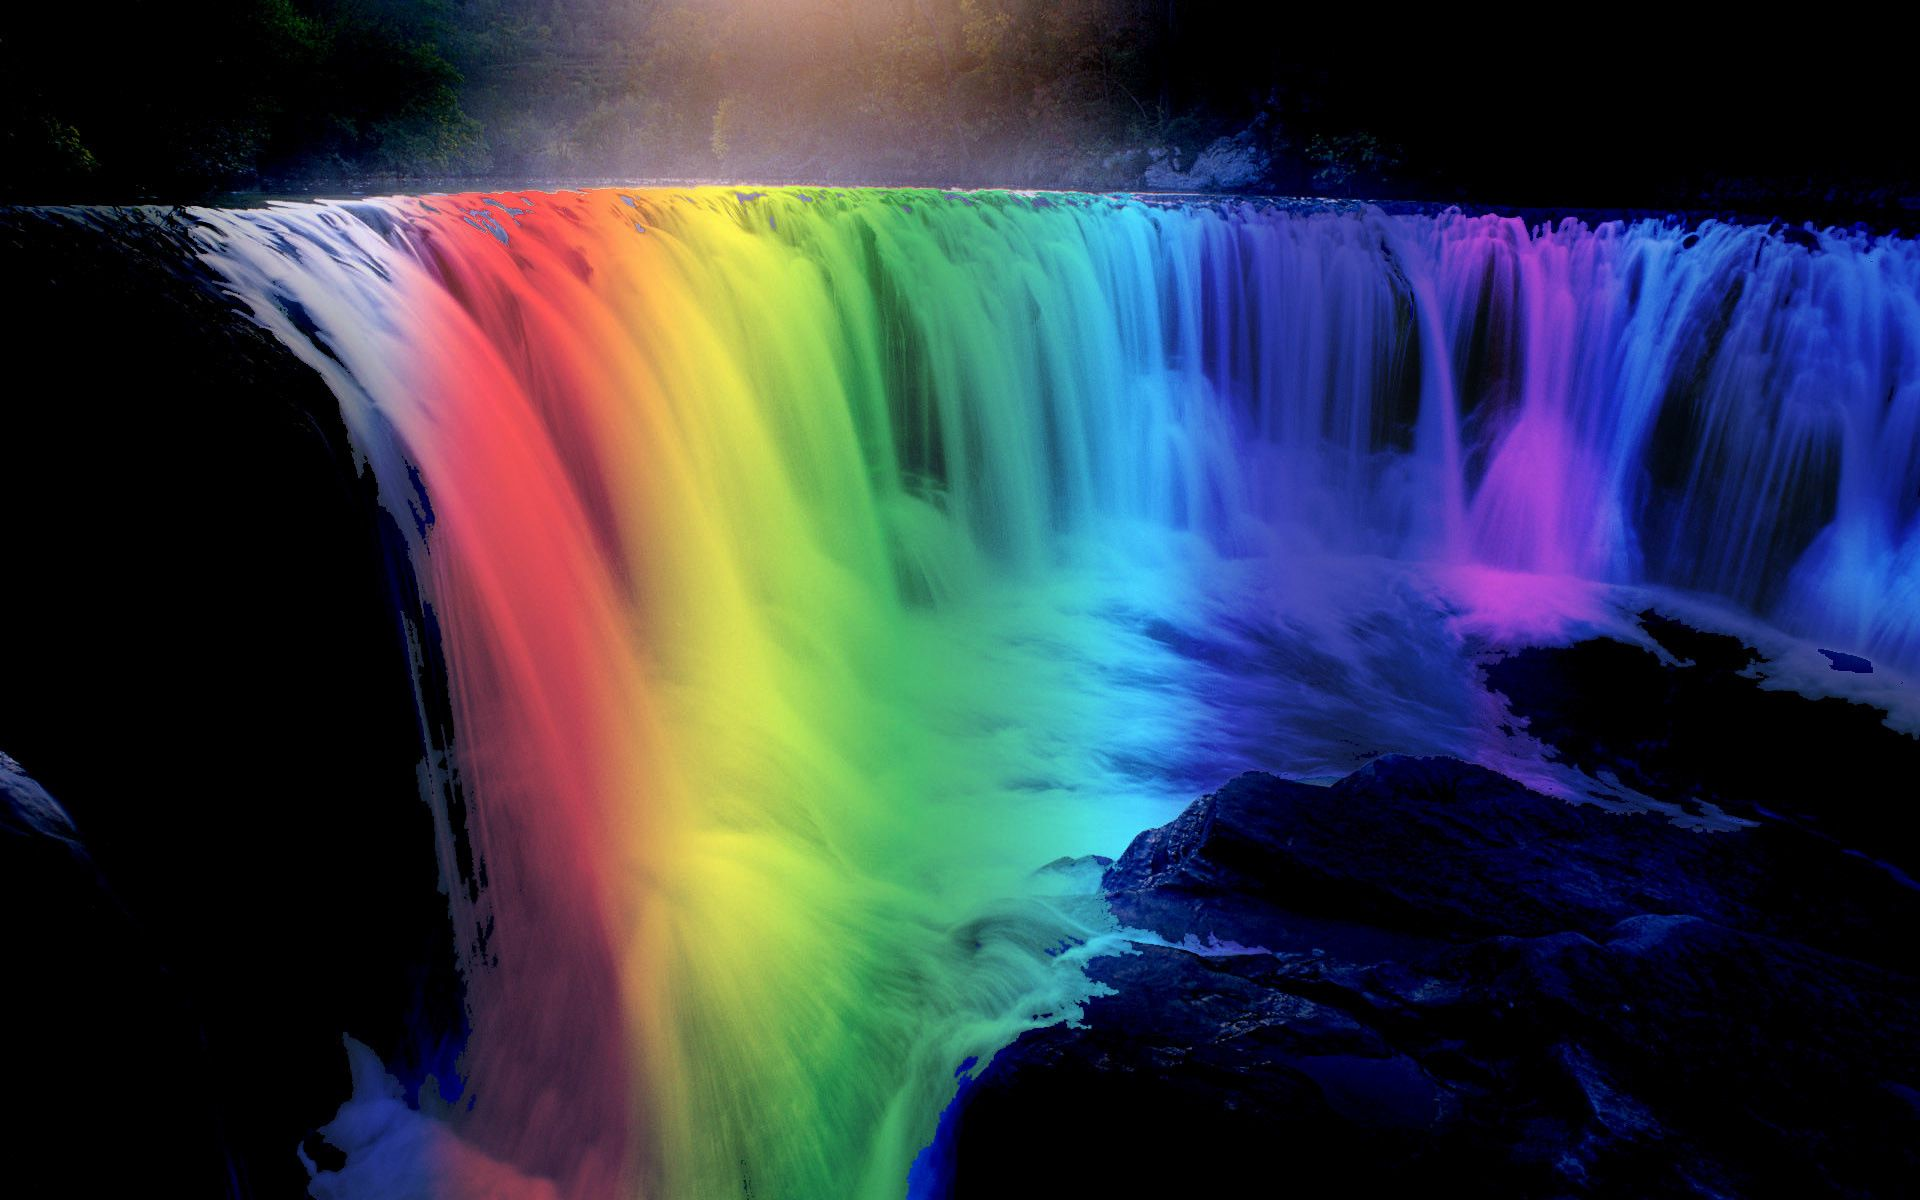 Waterfall And Rainbow Image For Desktop Wallpaper 1920 X 1200 Px 692 31 Kb Tropical Hd Rainforest 1920x1200 Rainbow Wallpaper Rainbow Waterfall Rainbow Images